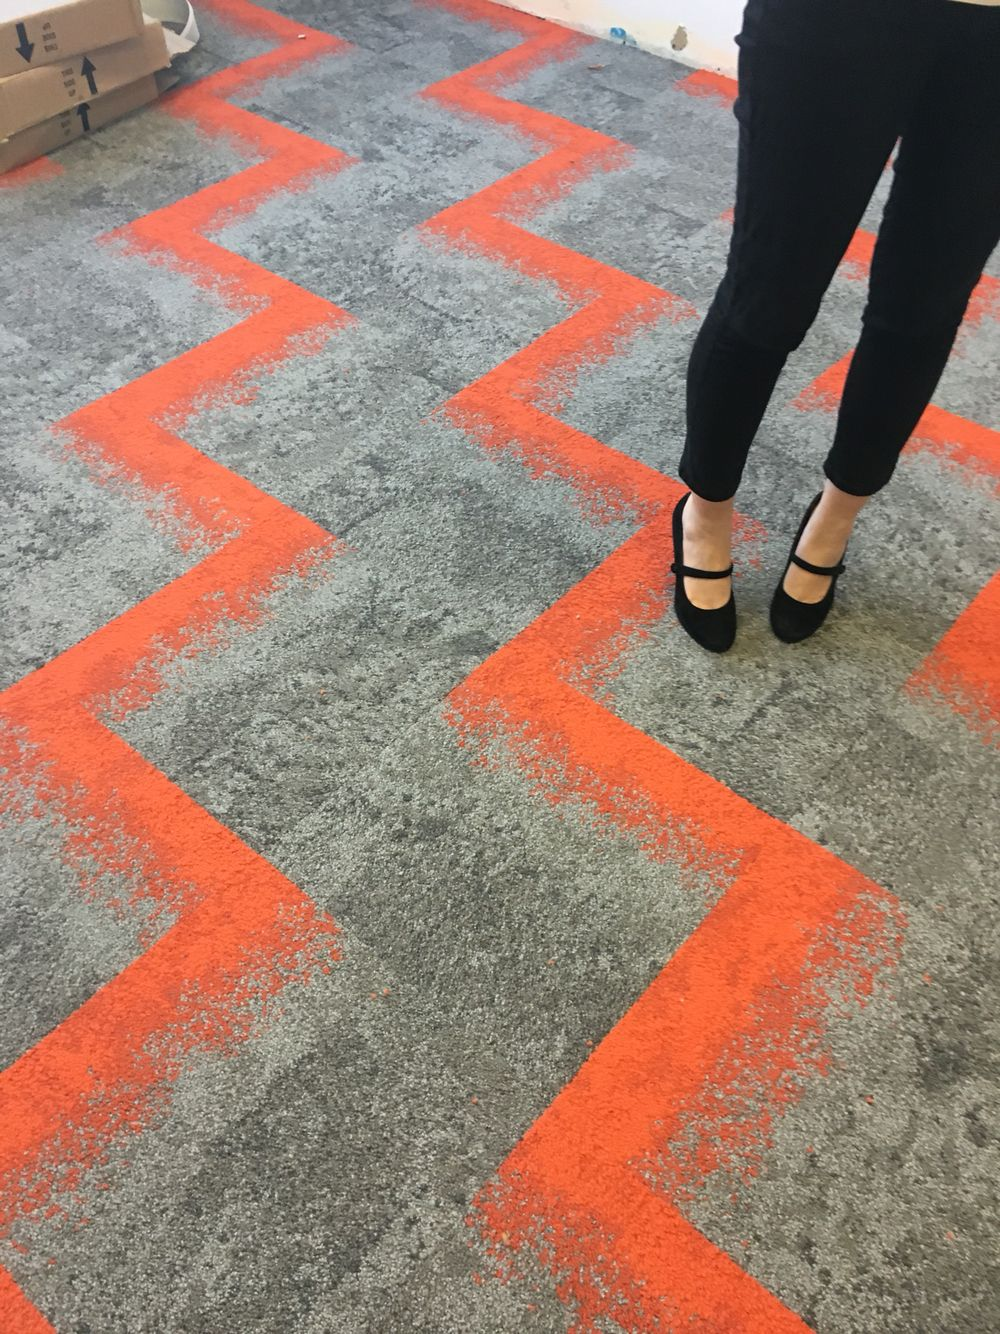 Love Urban Retreat Patterned Carpet Corporate Interiors